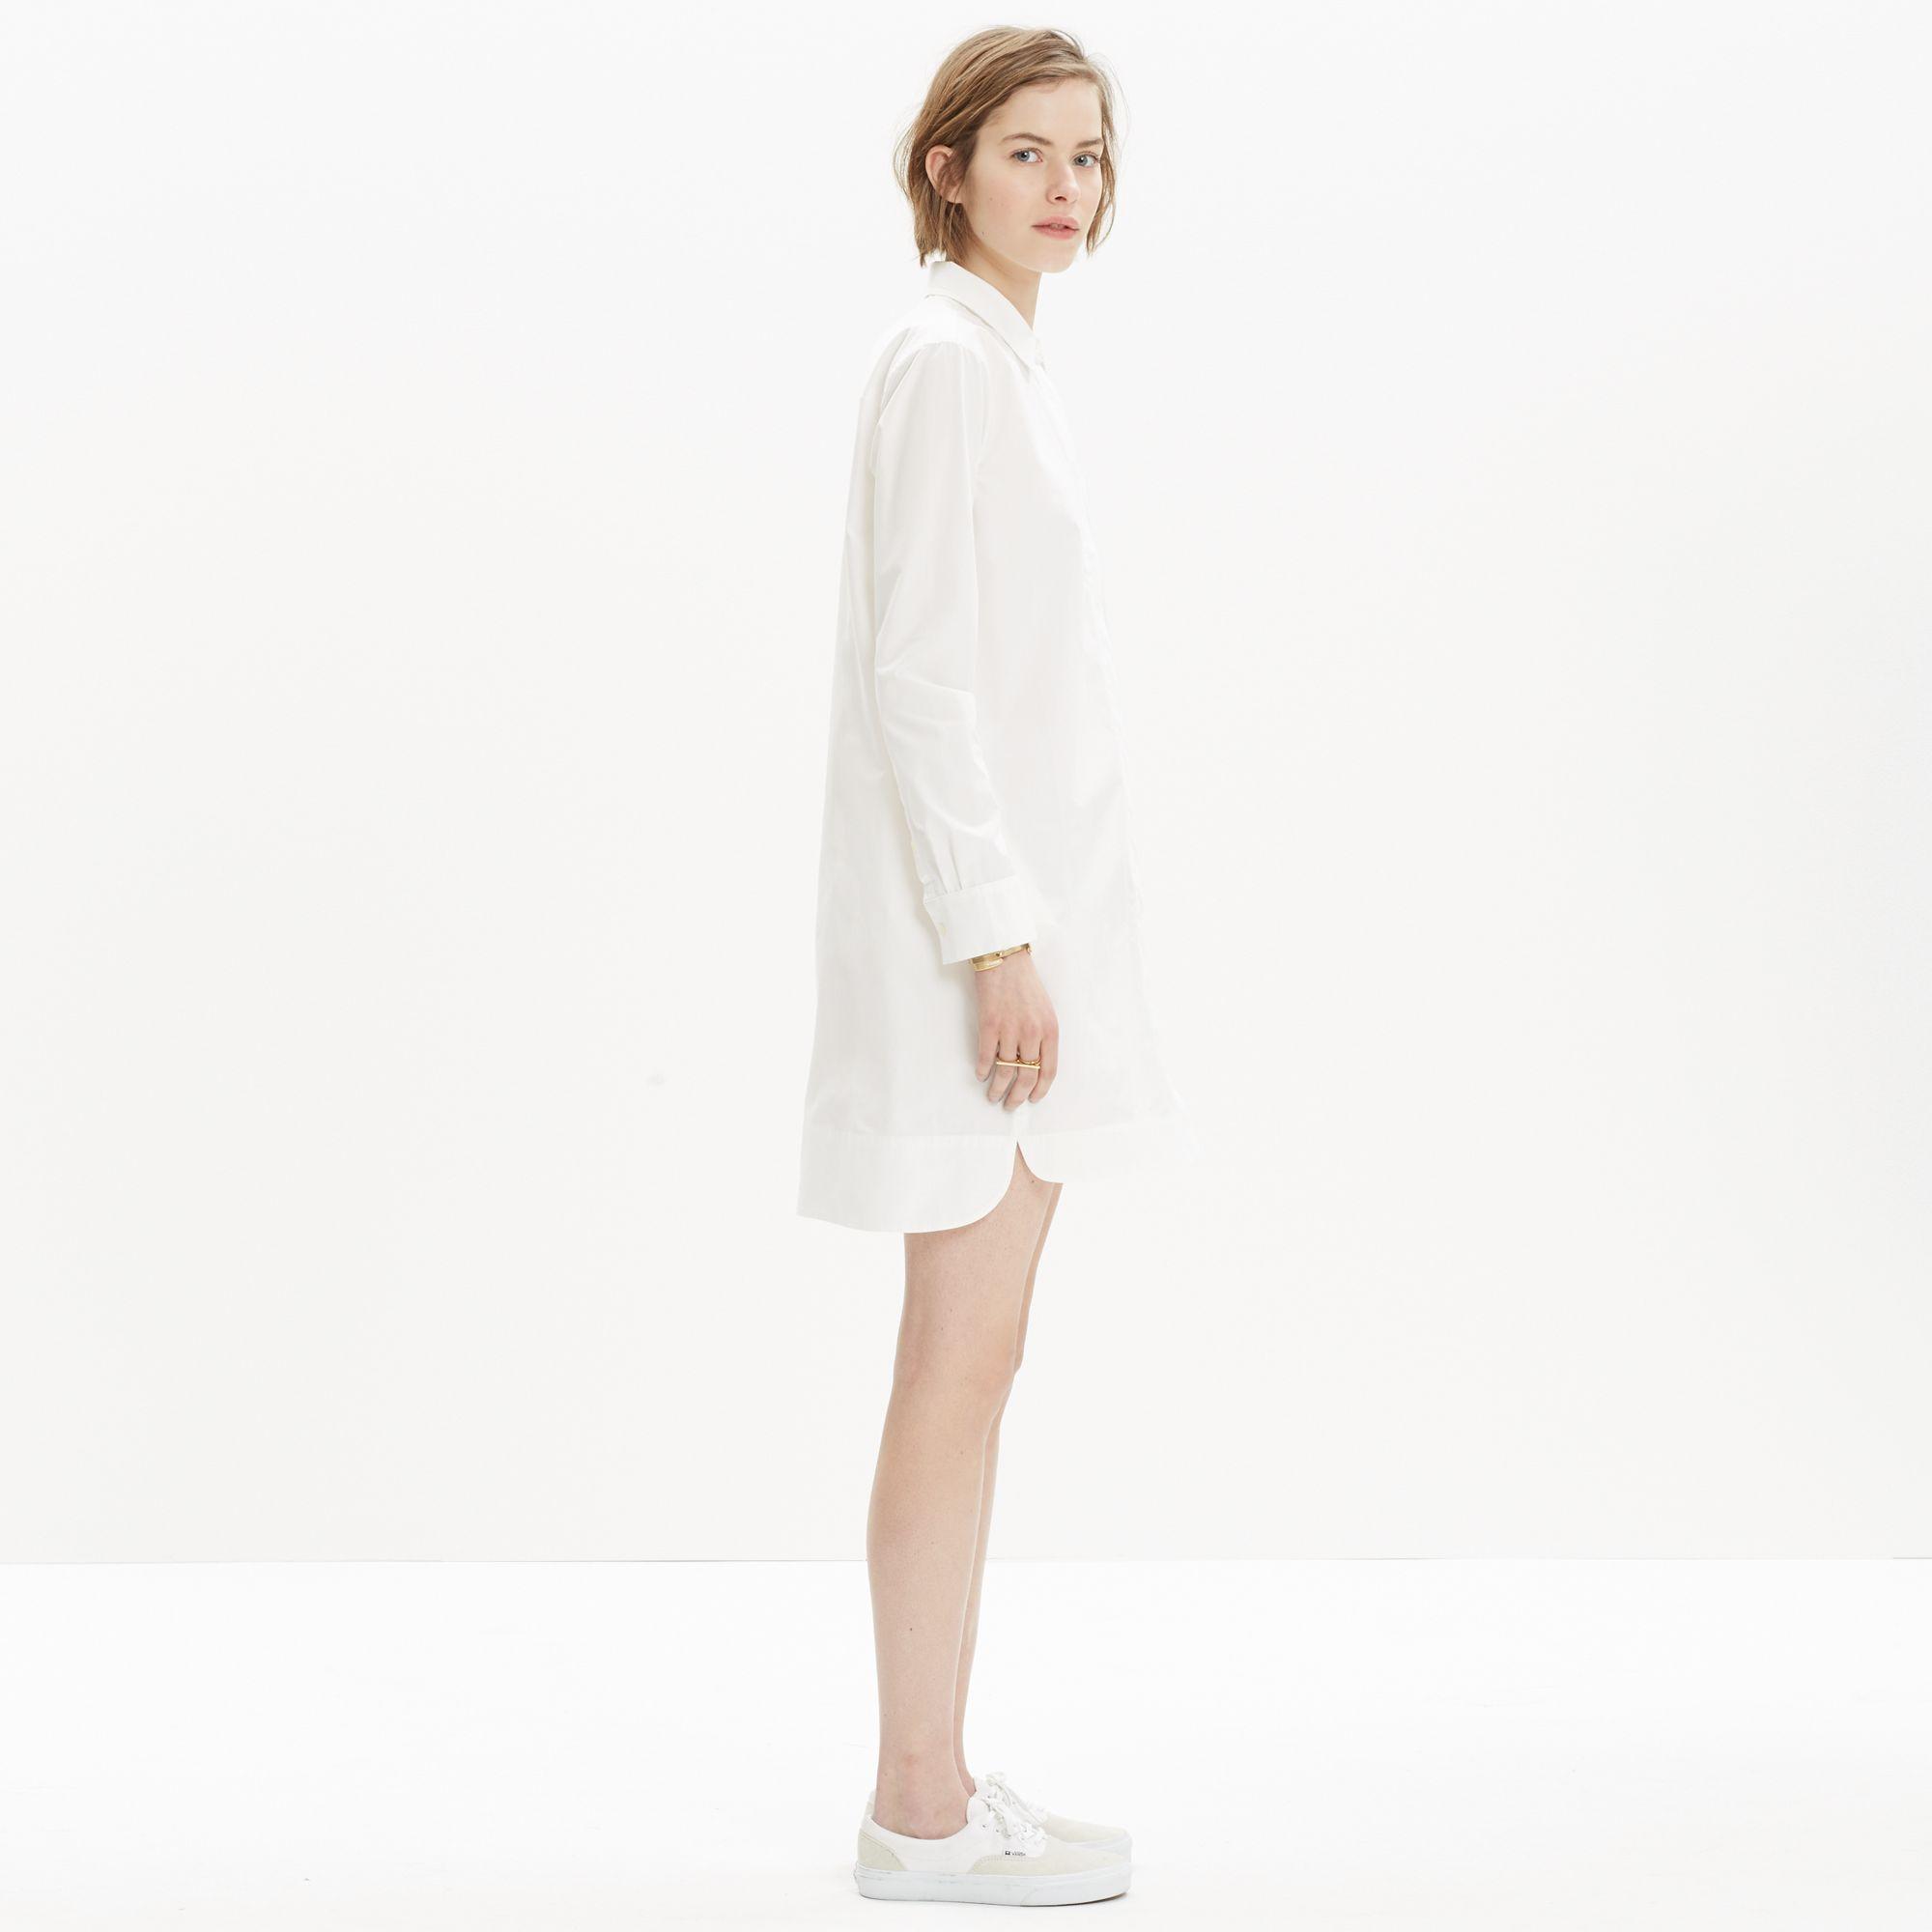 3b7dcb63207 Madewell Courtyard Shirtdress in White - Lyst